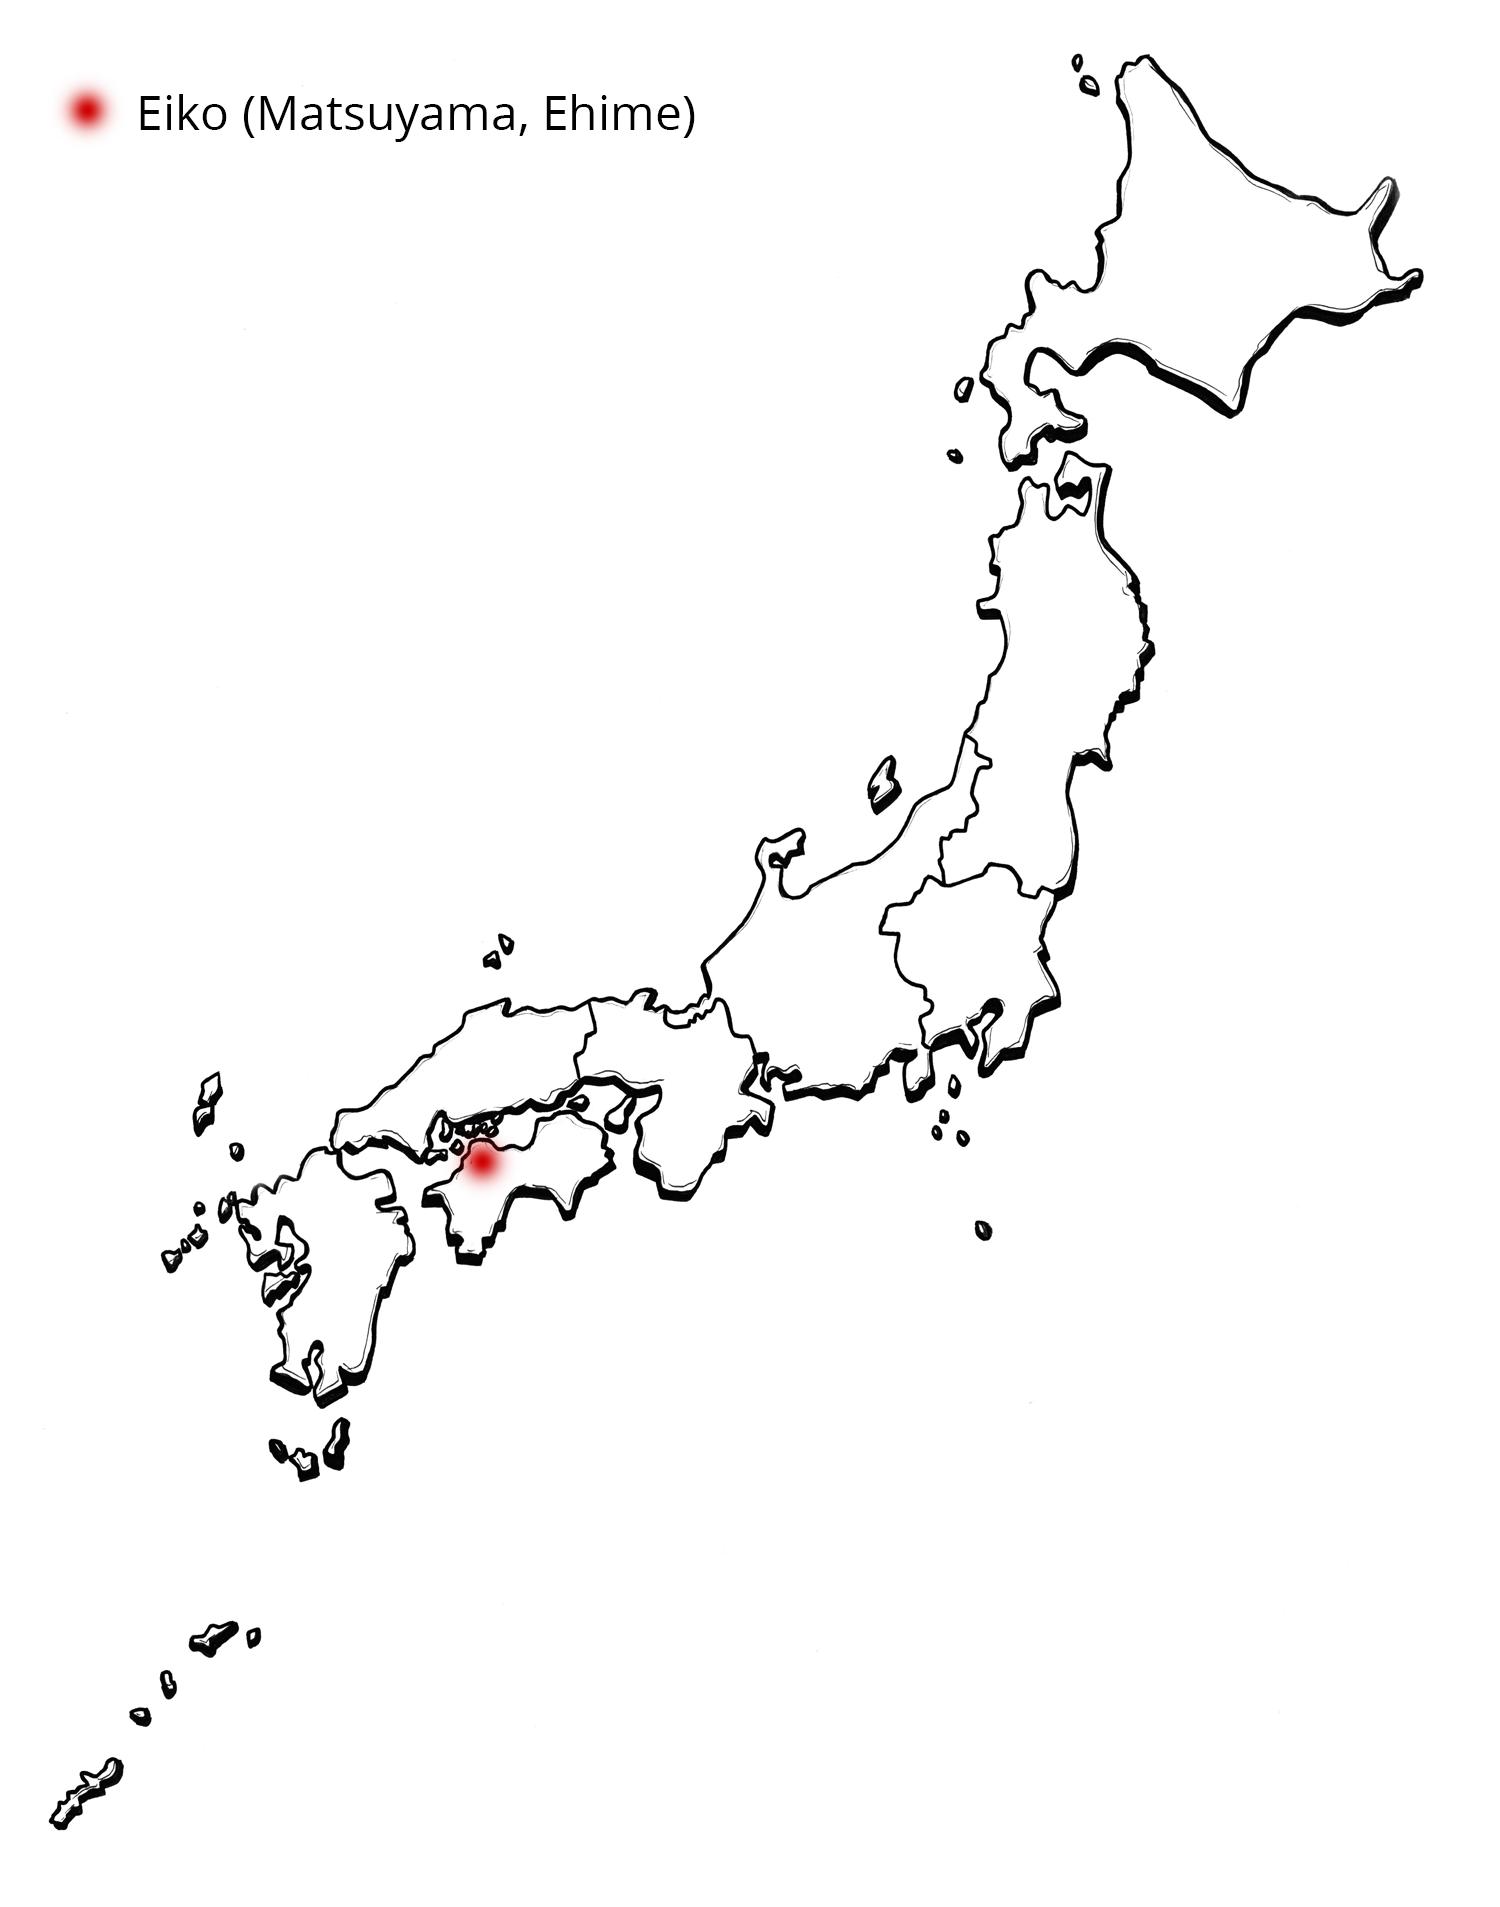 Shizuku KnowledgeBreweries Distilleries - Japan map 4 main islands